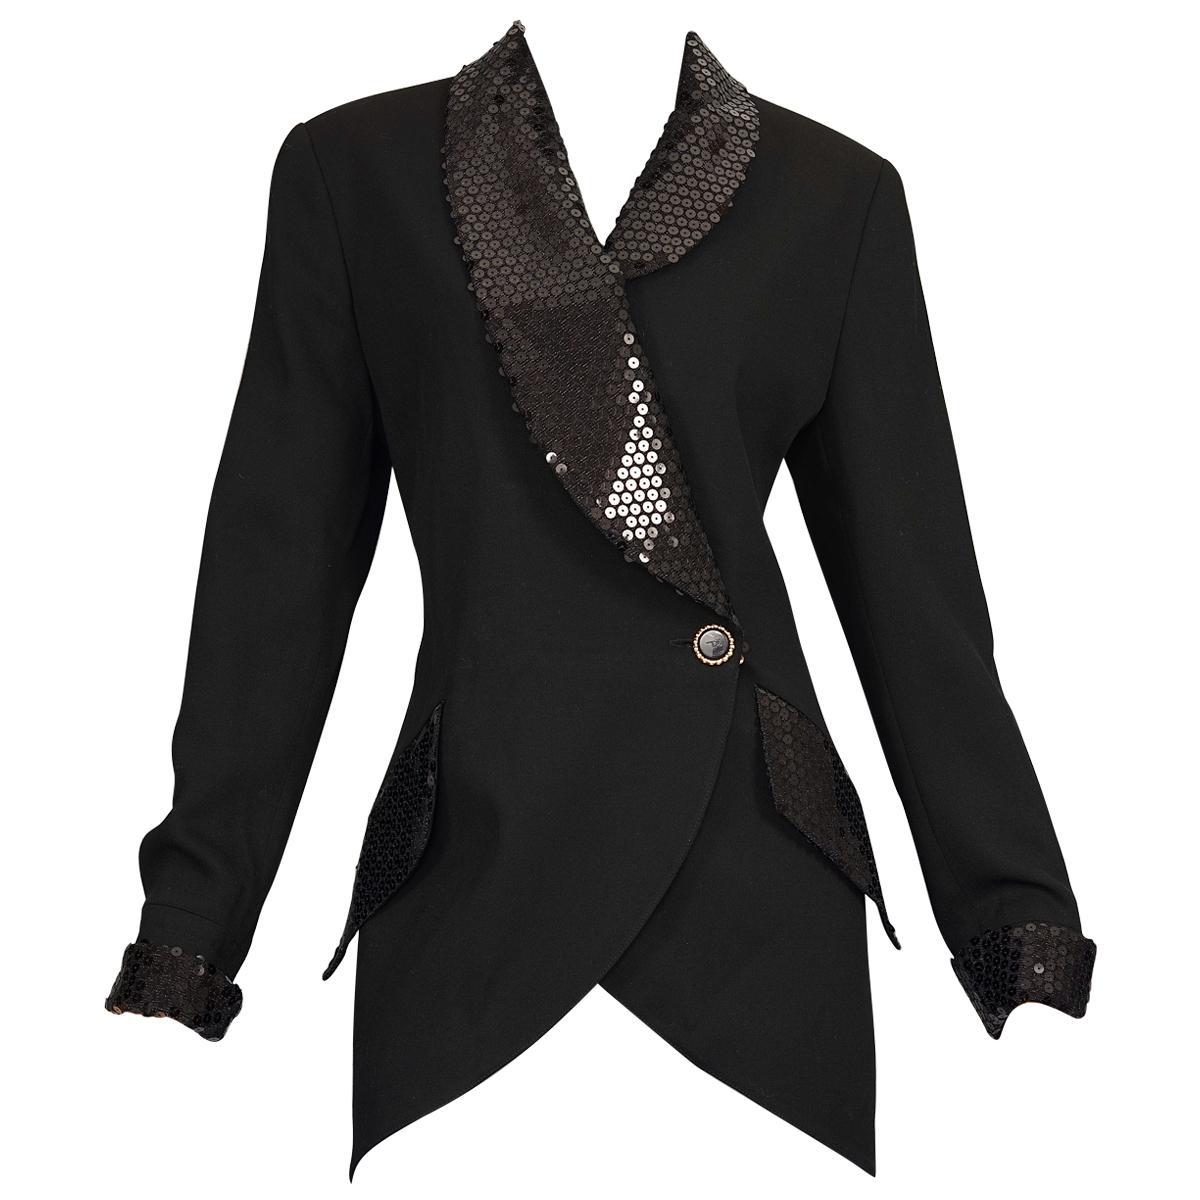 Vintage KARL LAGERFELD Black Sequin Blazer Jacket